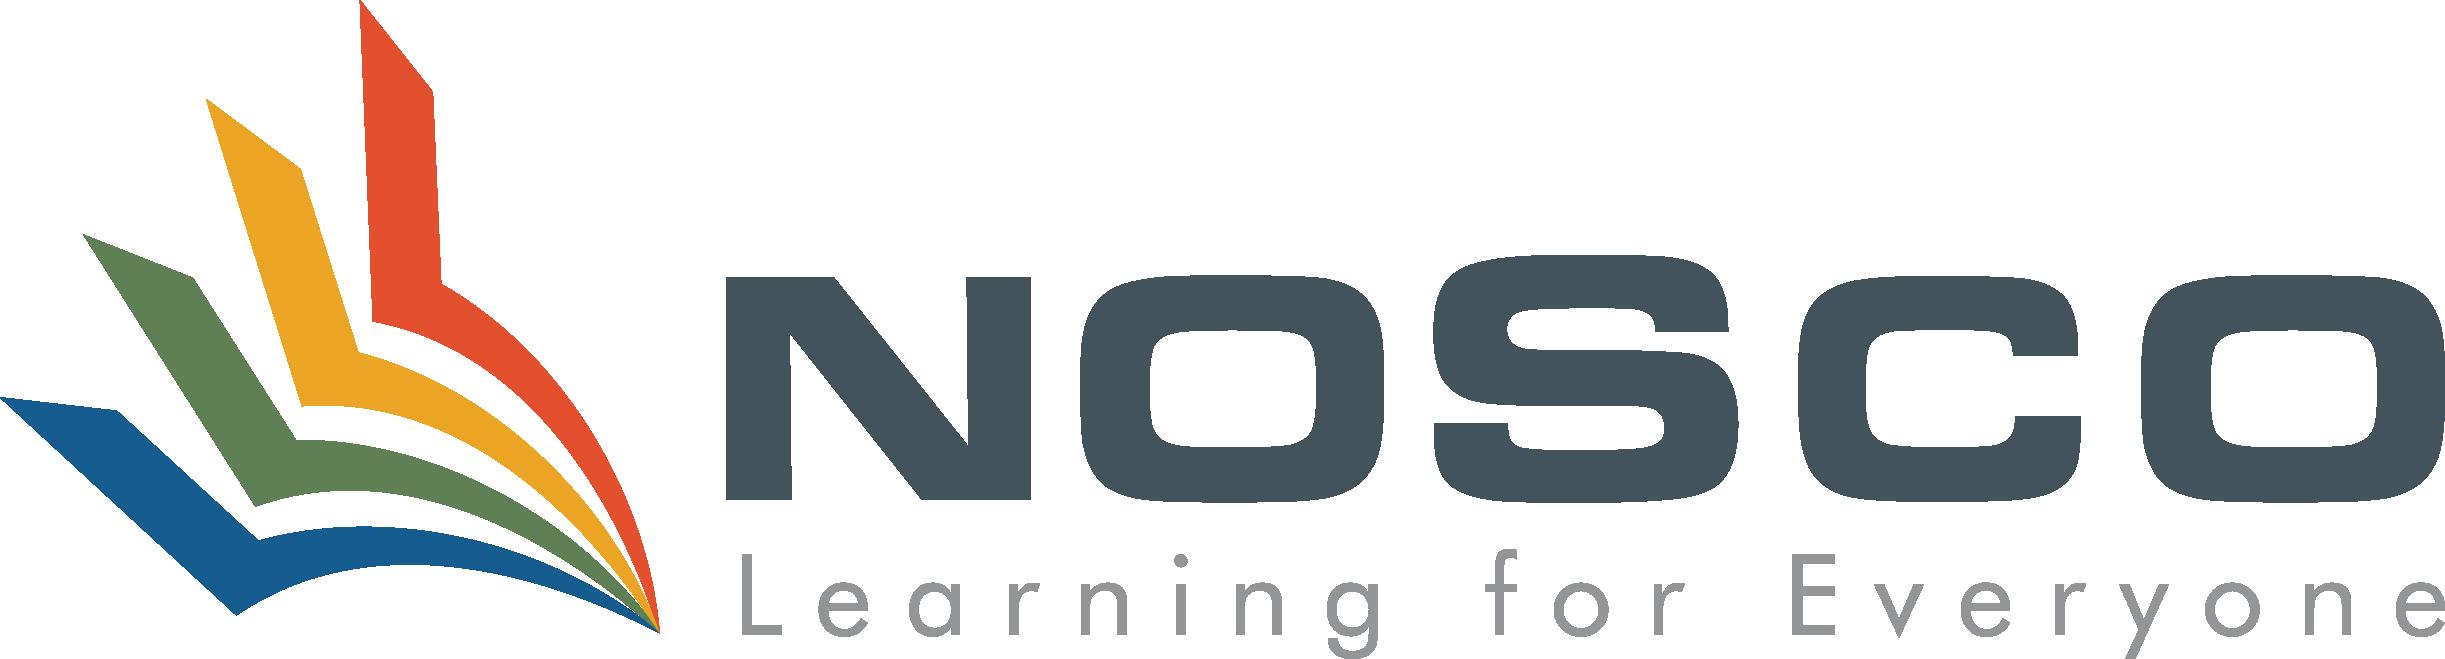 Nosco Learning